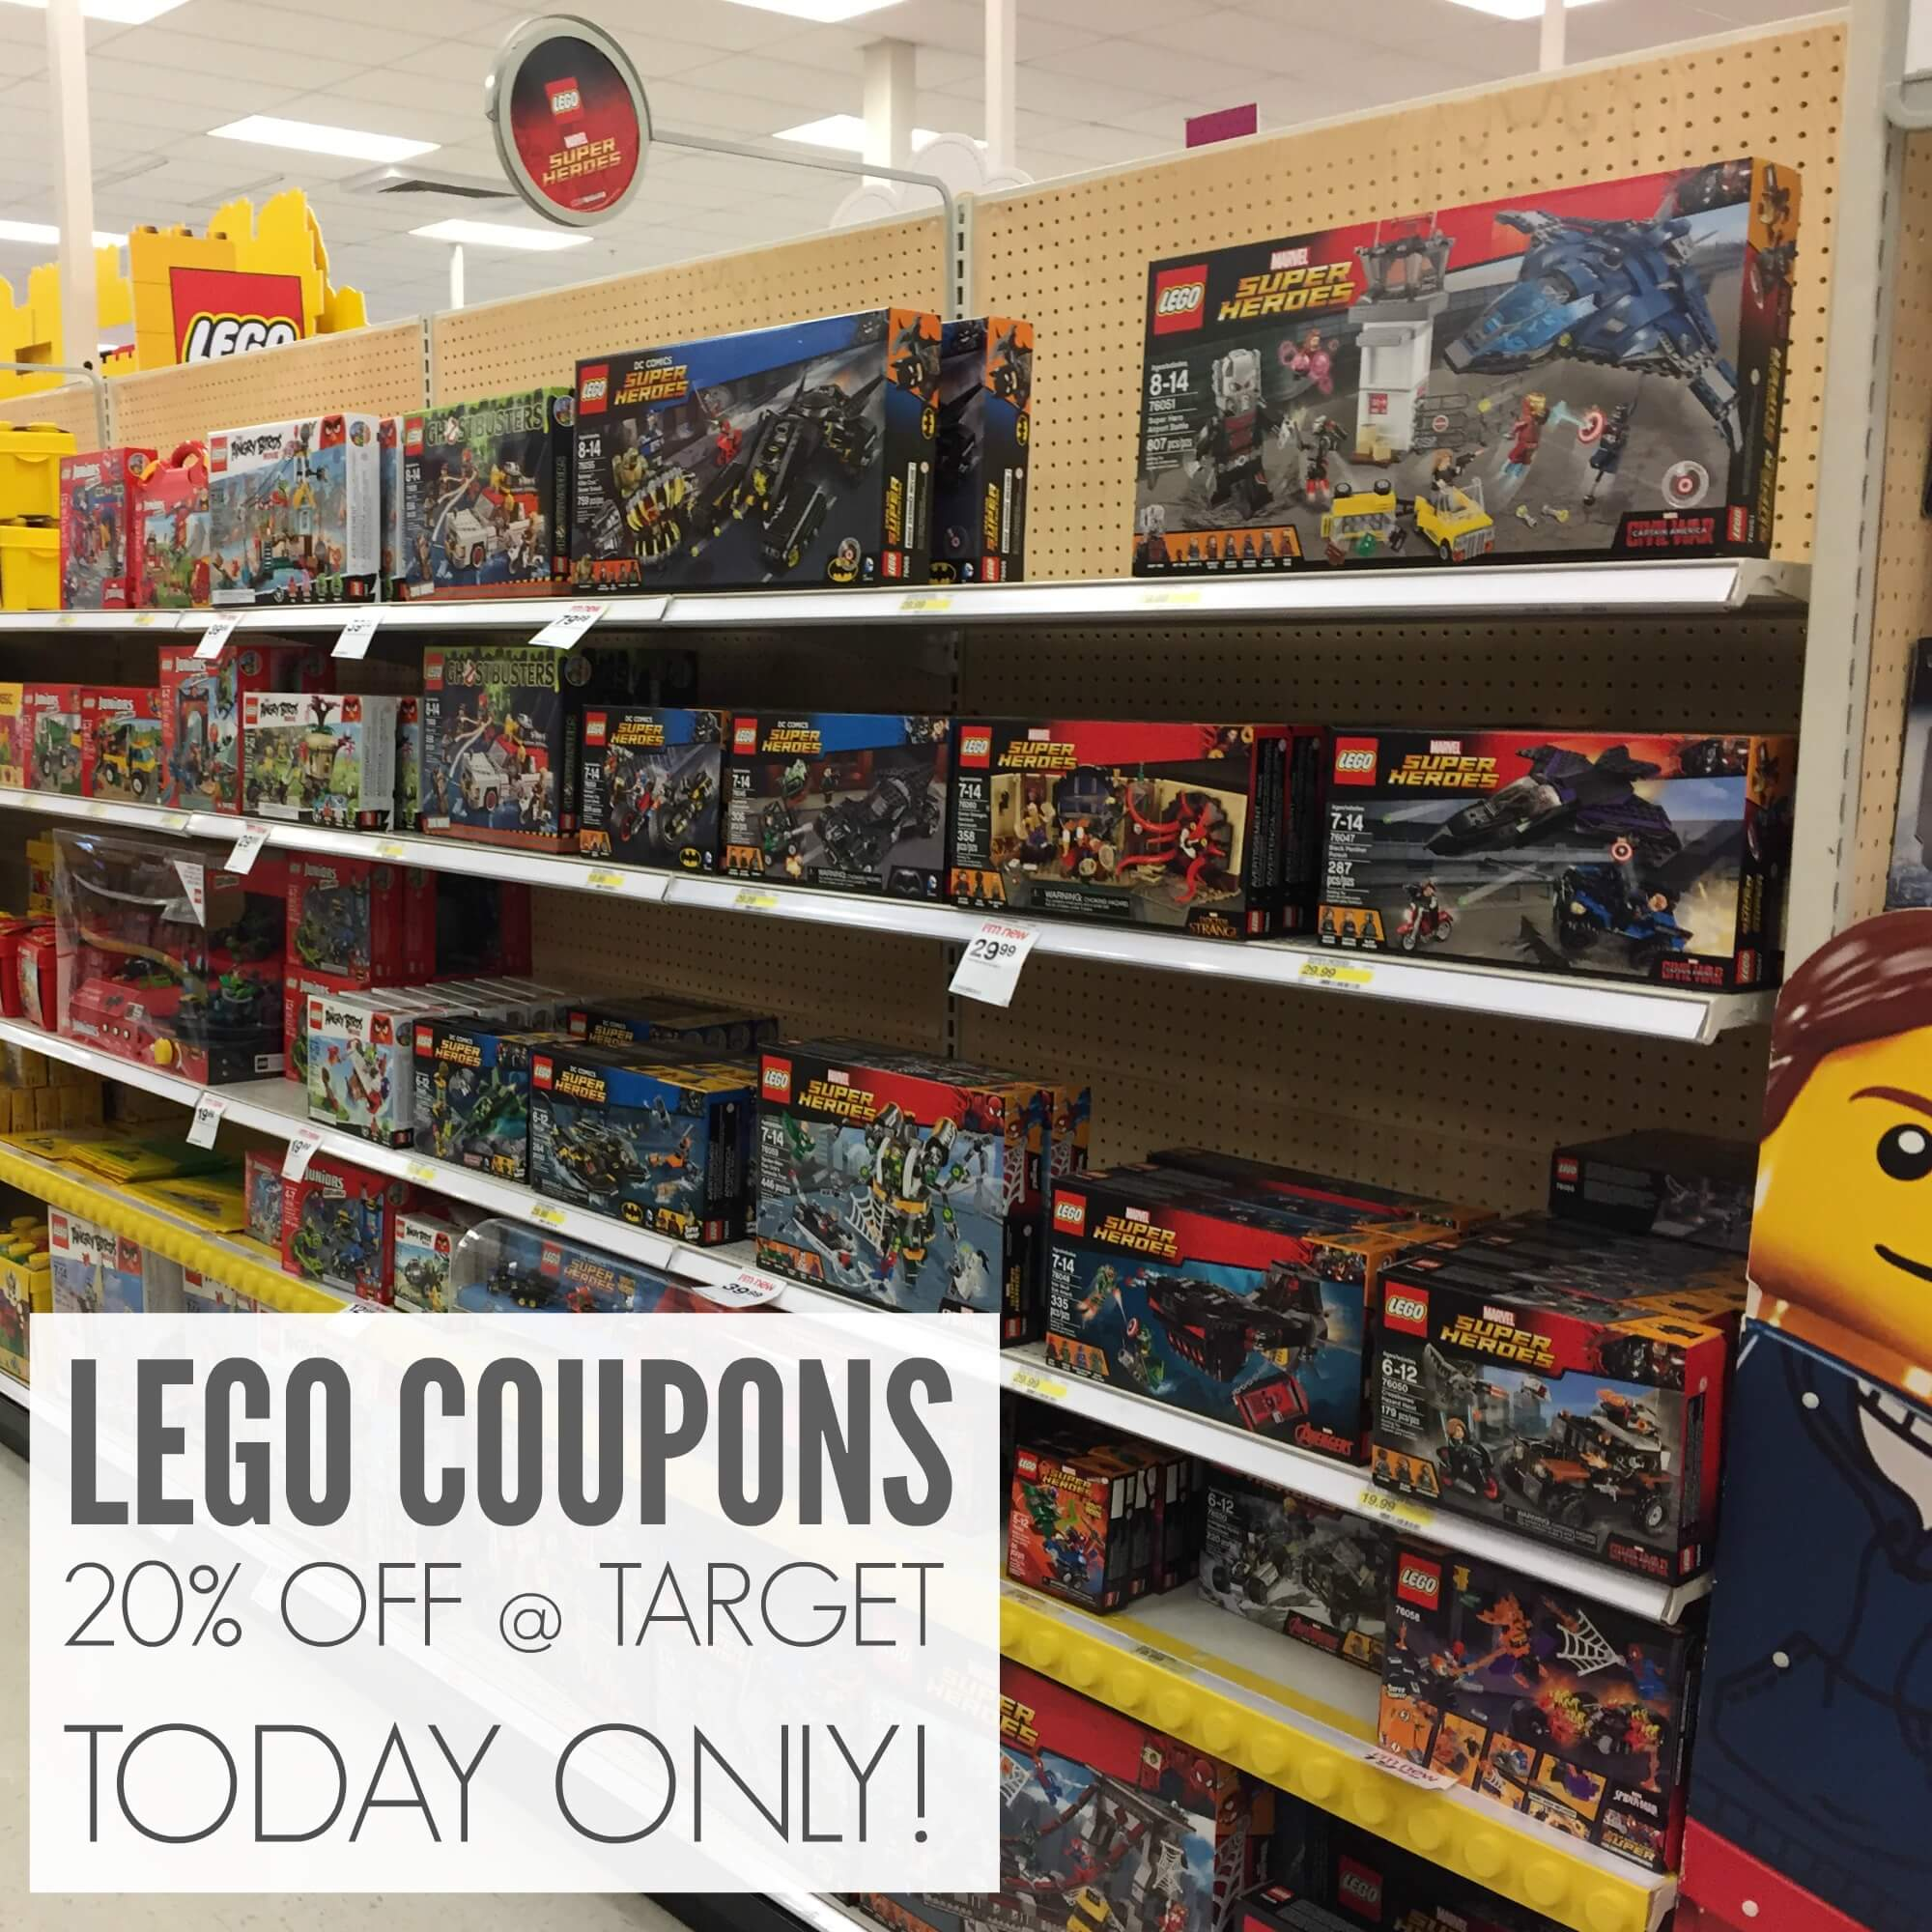 RARE 20 Target Cartwheel LEGO Coupons